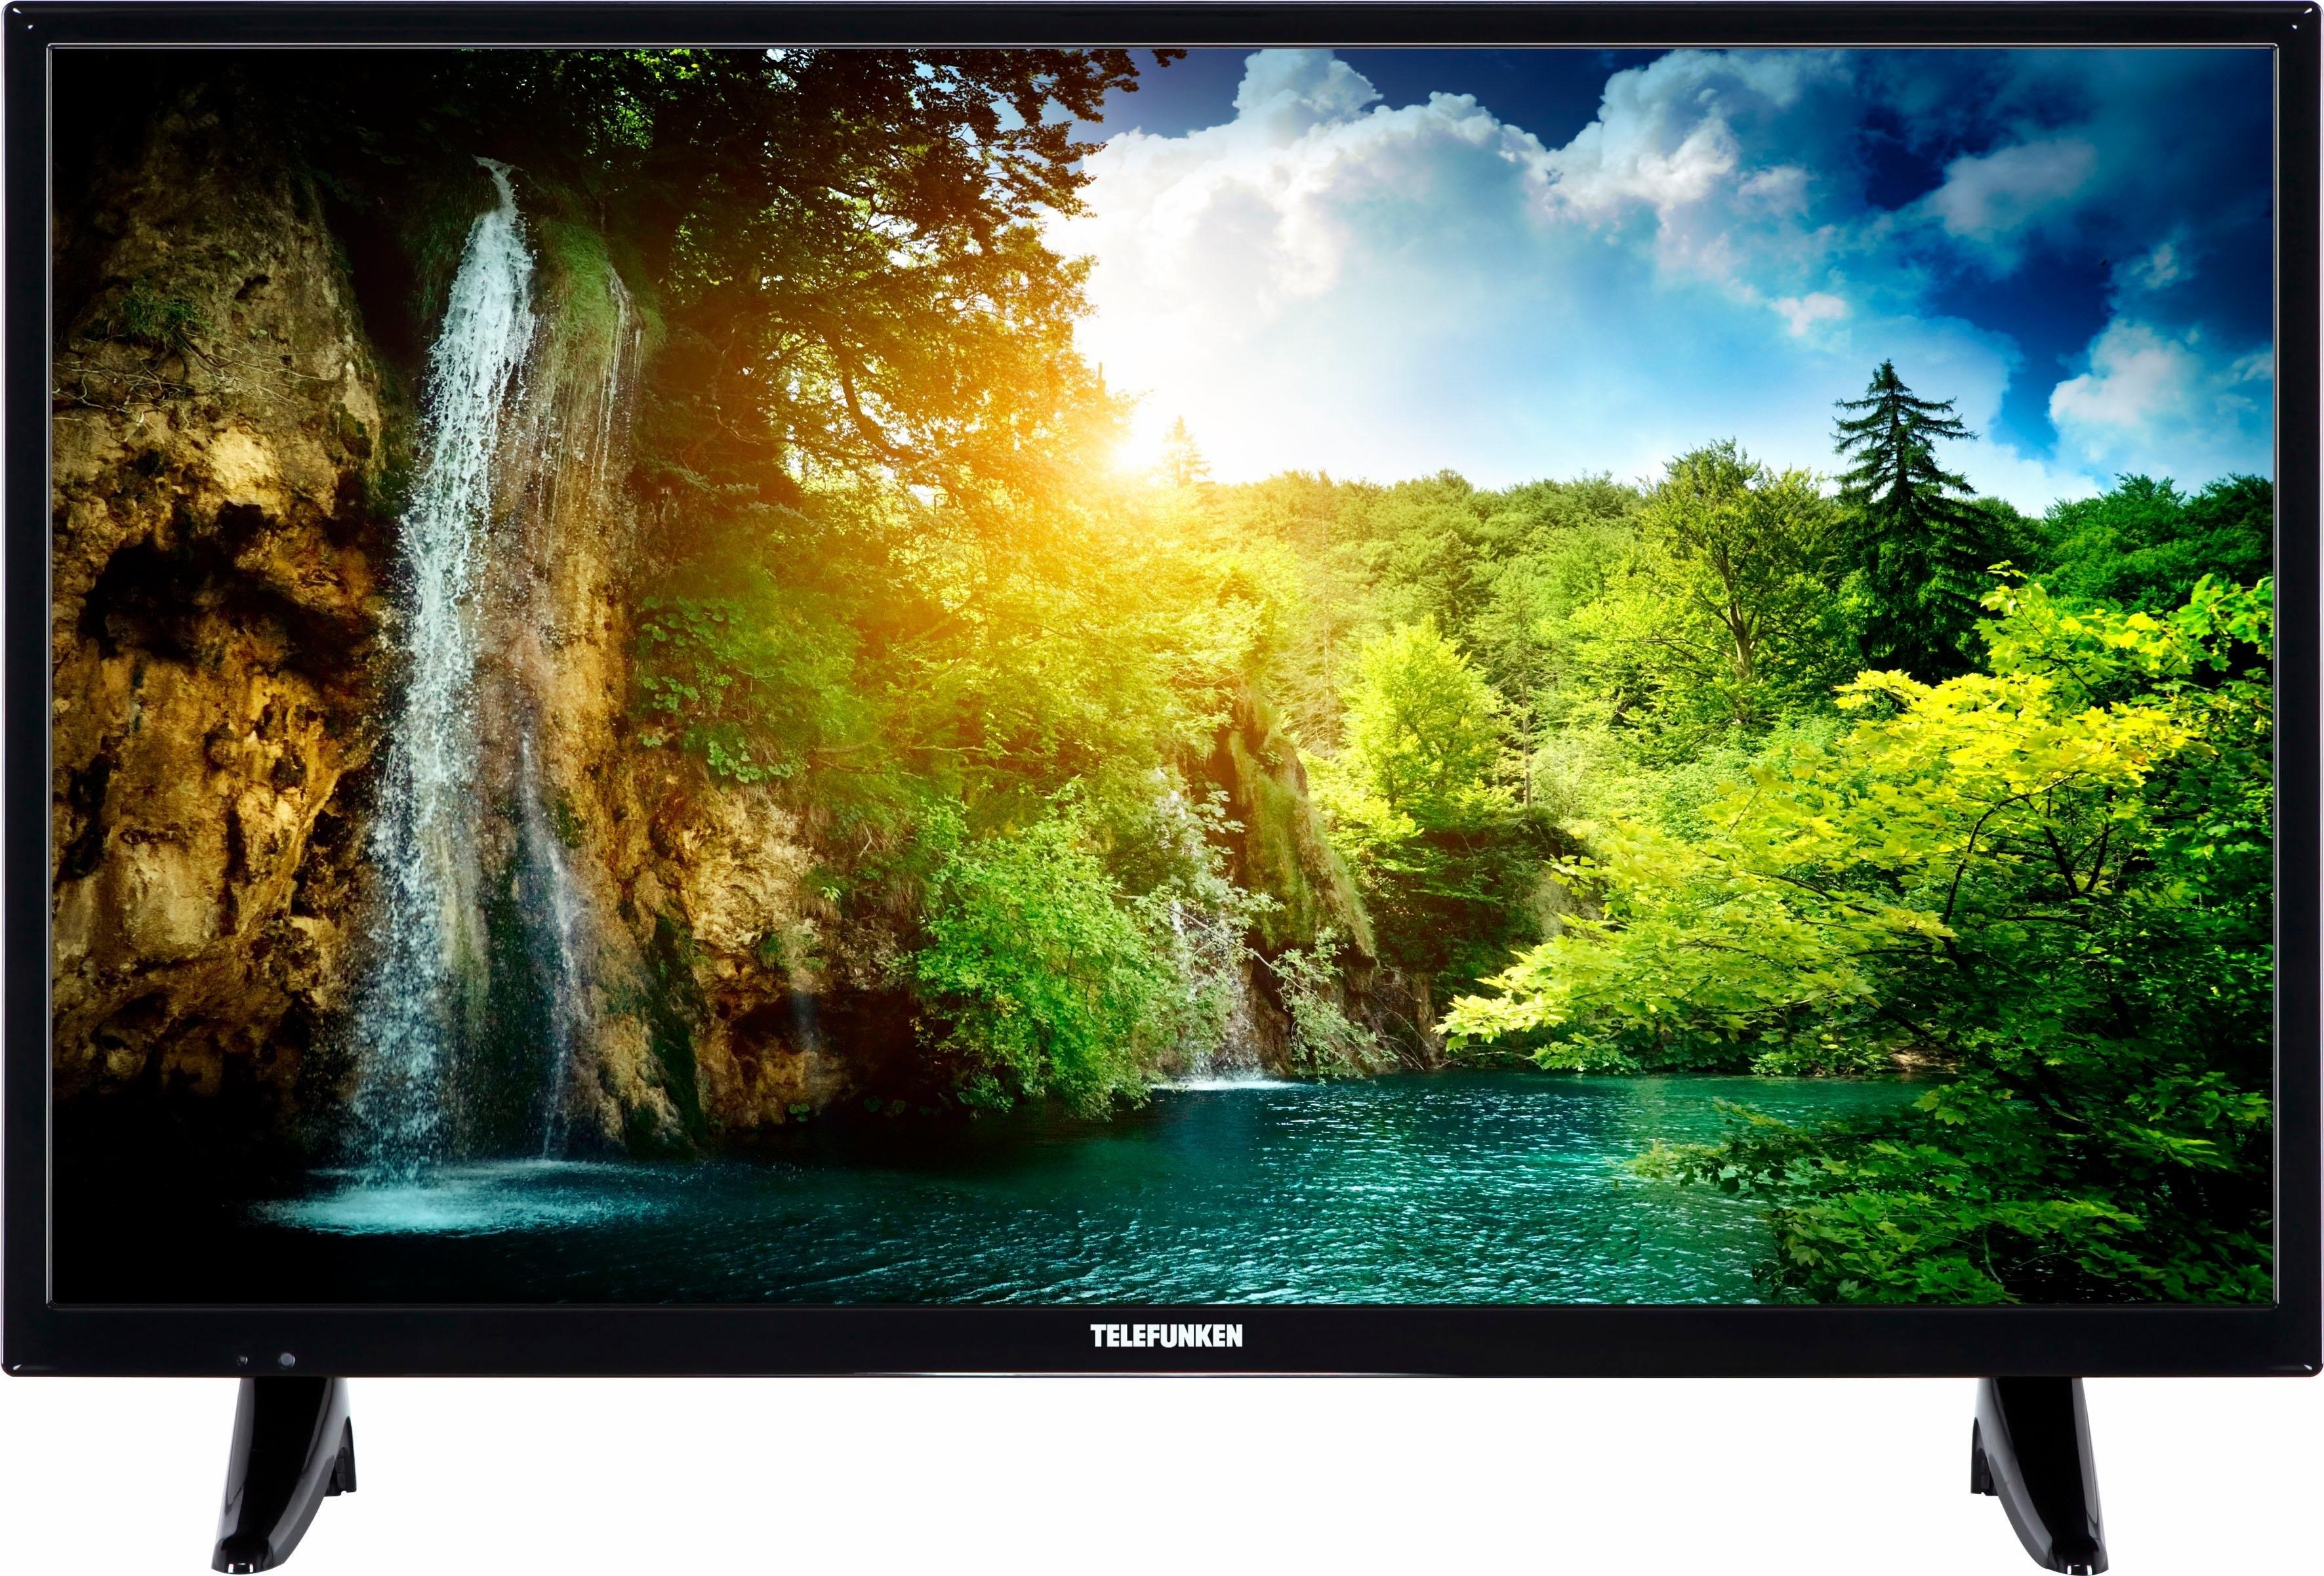 Telefunken D32H287M4, LED-TV, 81 cm (32 inch), HD Ready 1366x768 in de webshop van OTTO kopen